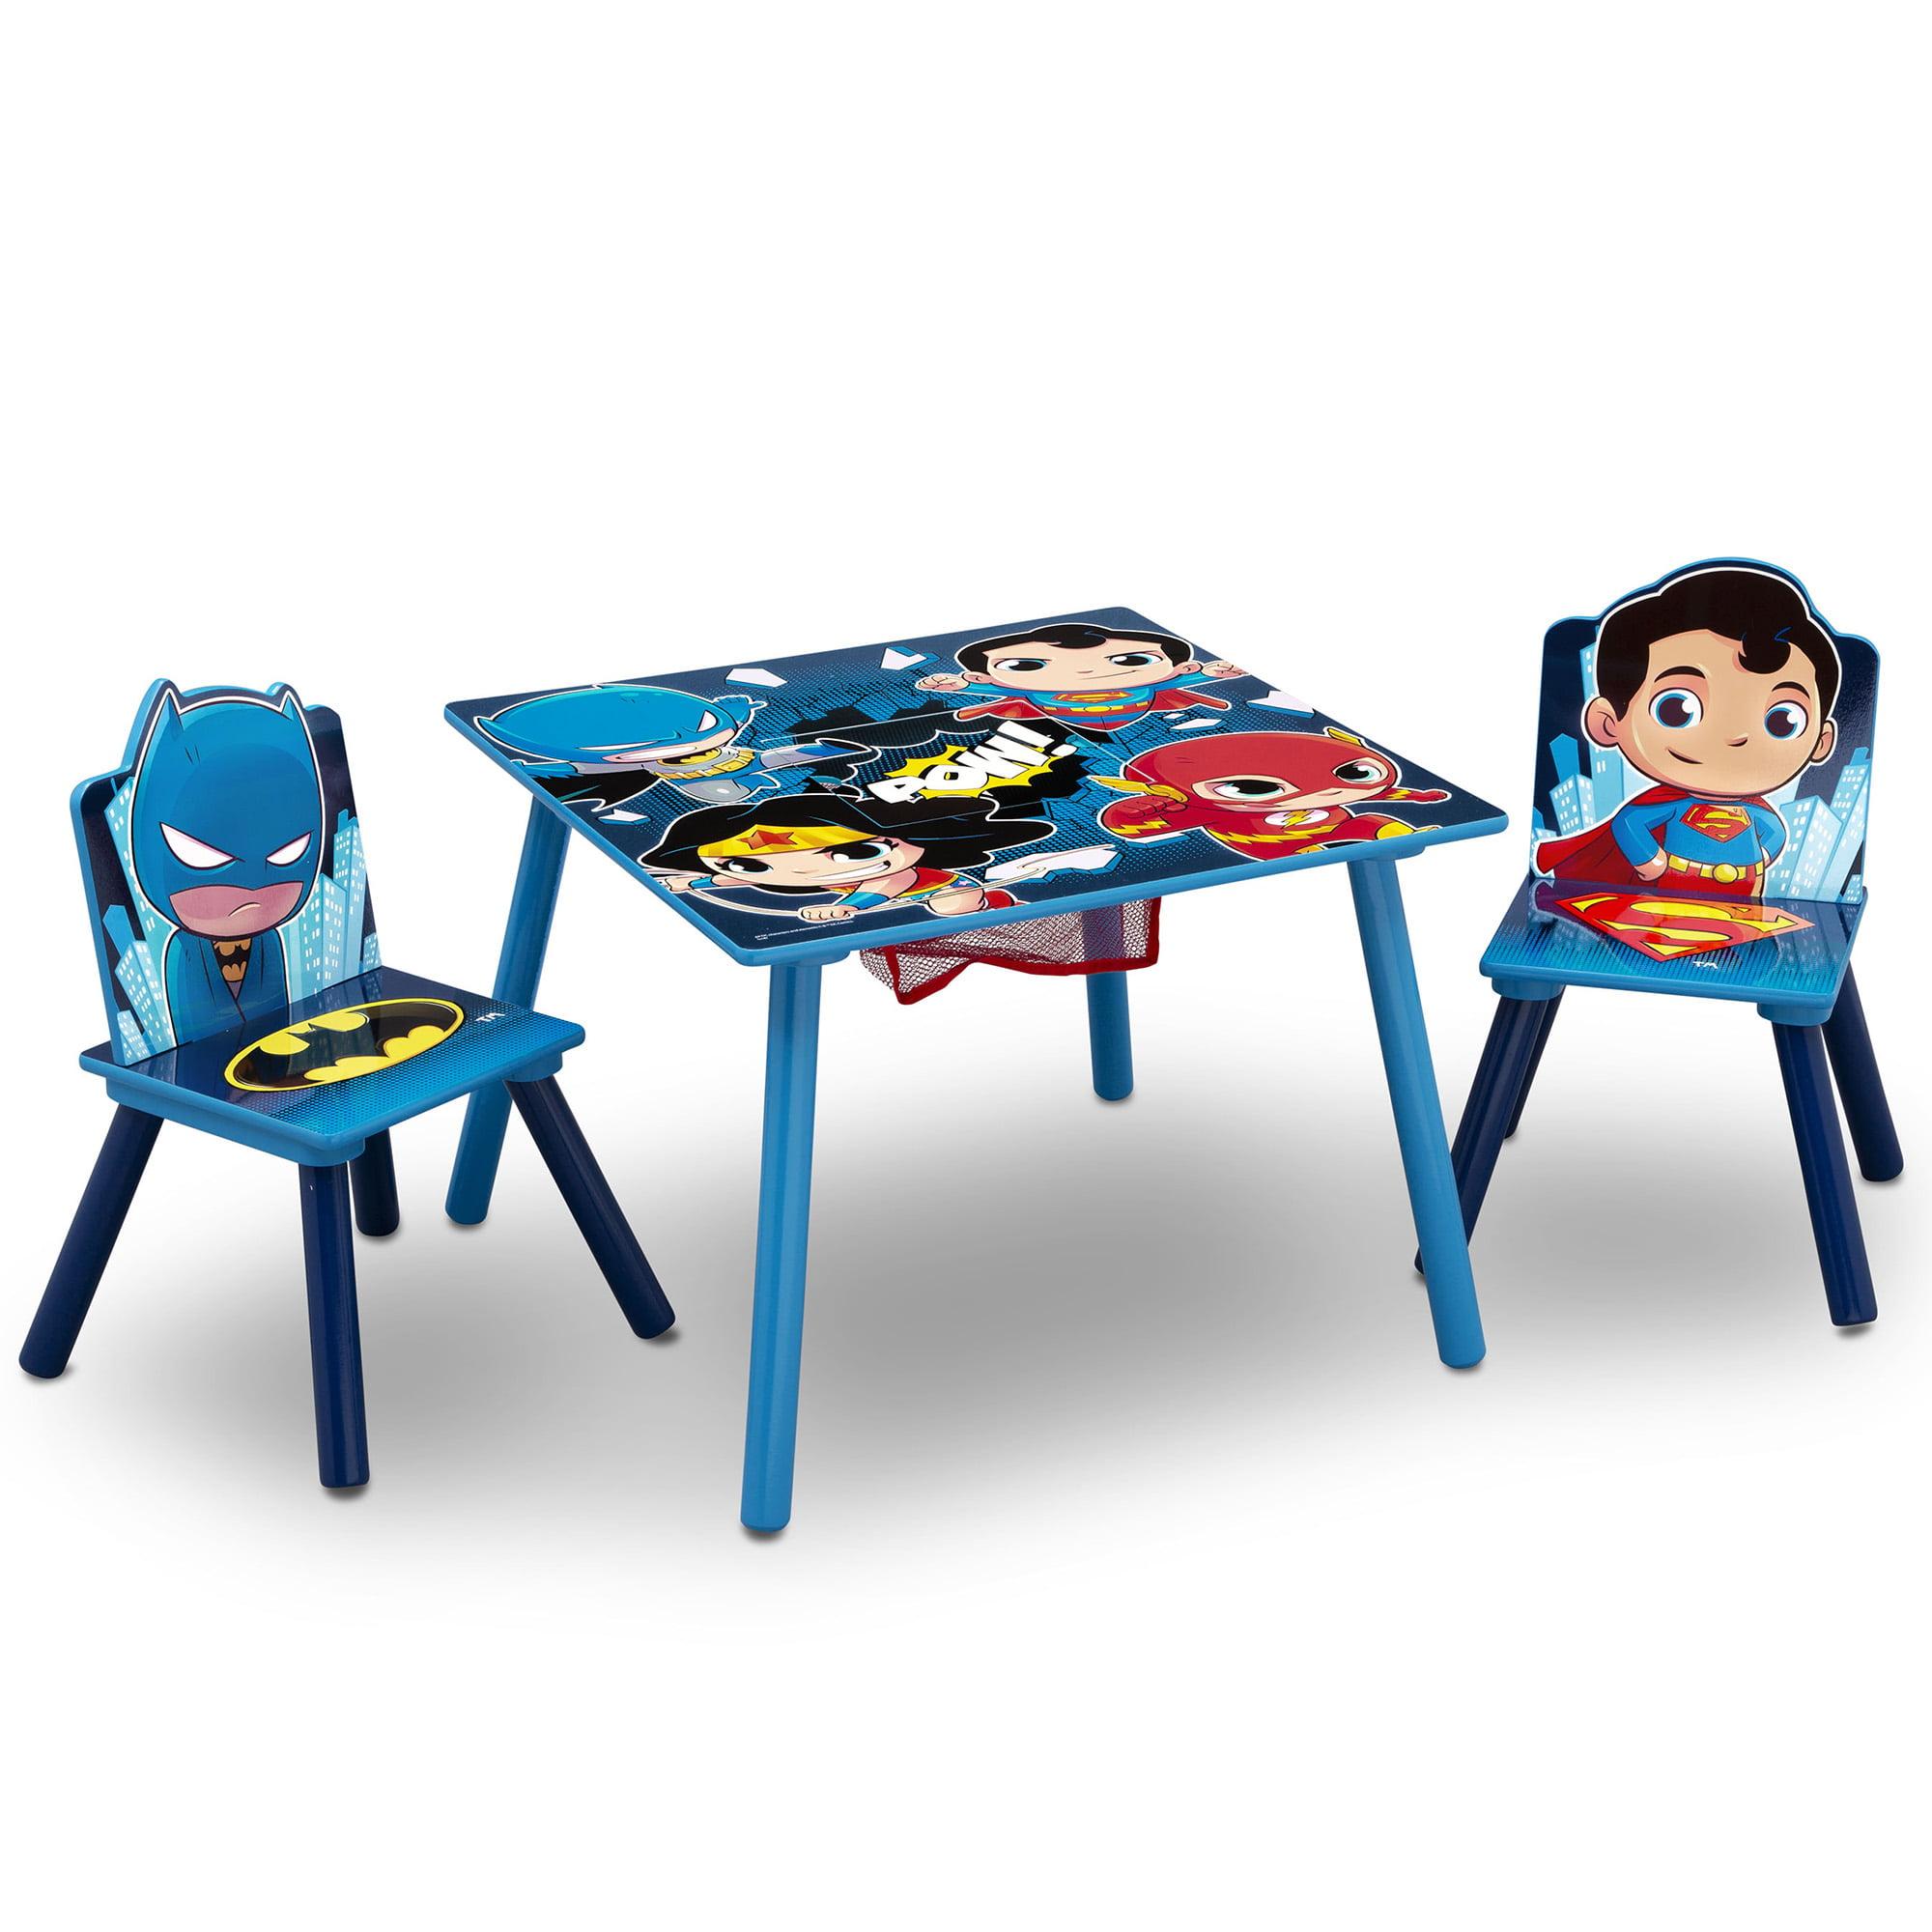 DC Super Friends (Batman, Superman, Wonder Woman, The Flash) Kids Table and Chair Set with Storage by Delta Children